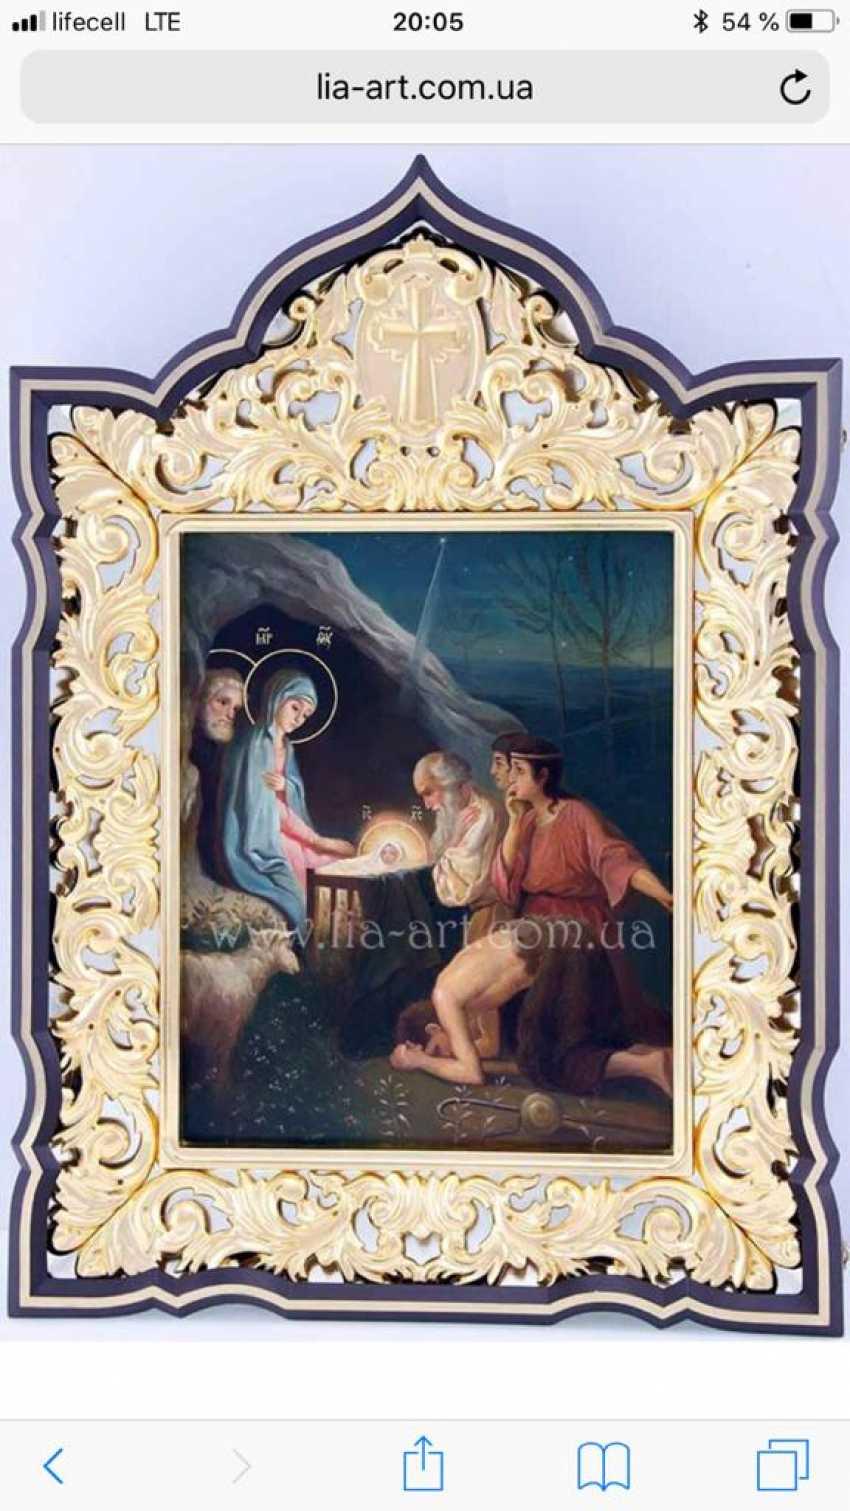 Lilia Kovalenko. Saints Boris and Gleb, the last supper, the Transfiguration, the Nativity - photo 4